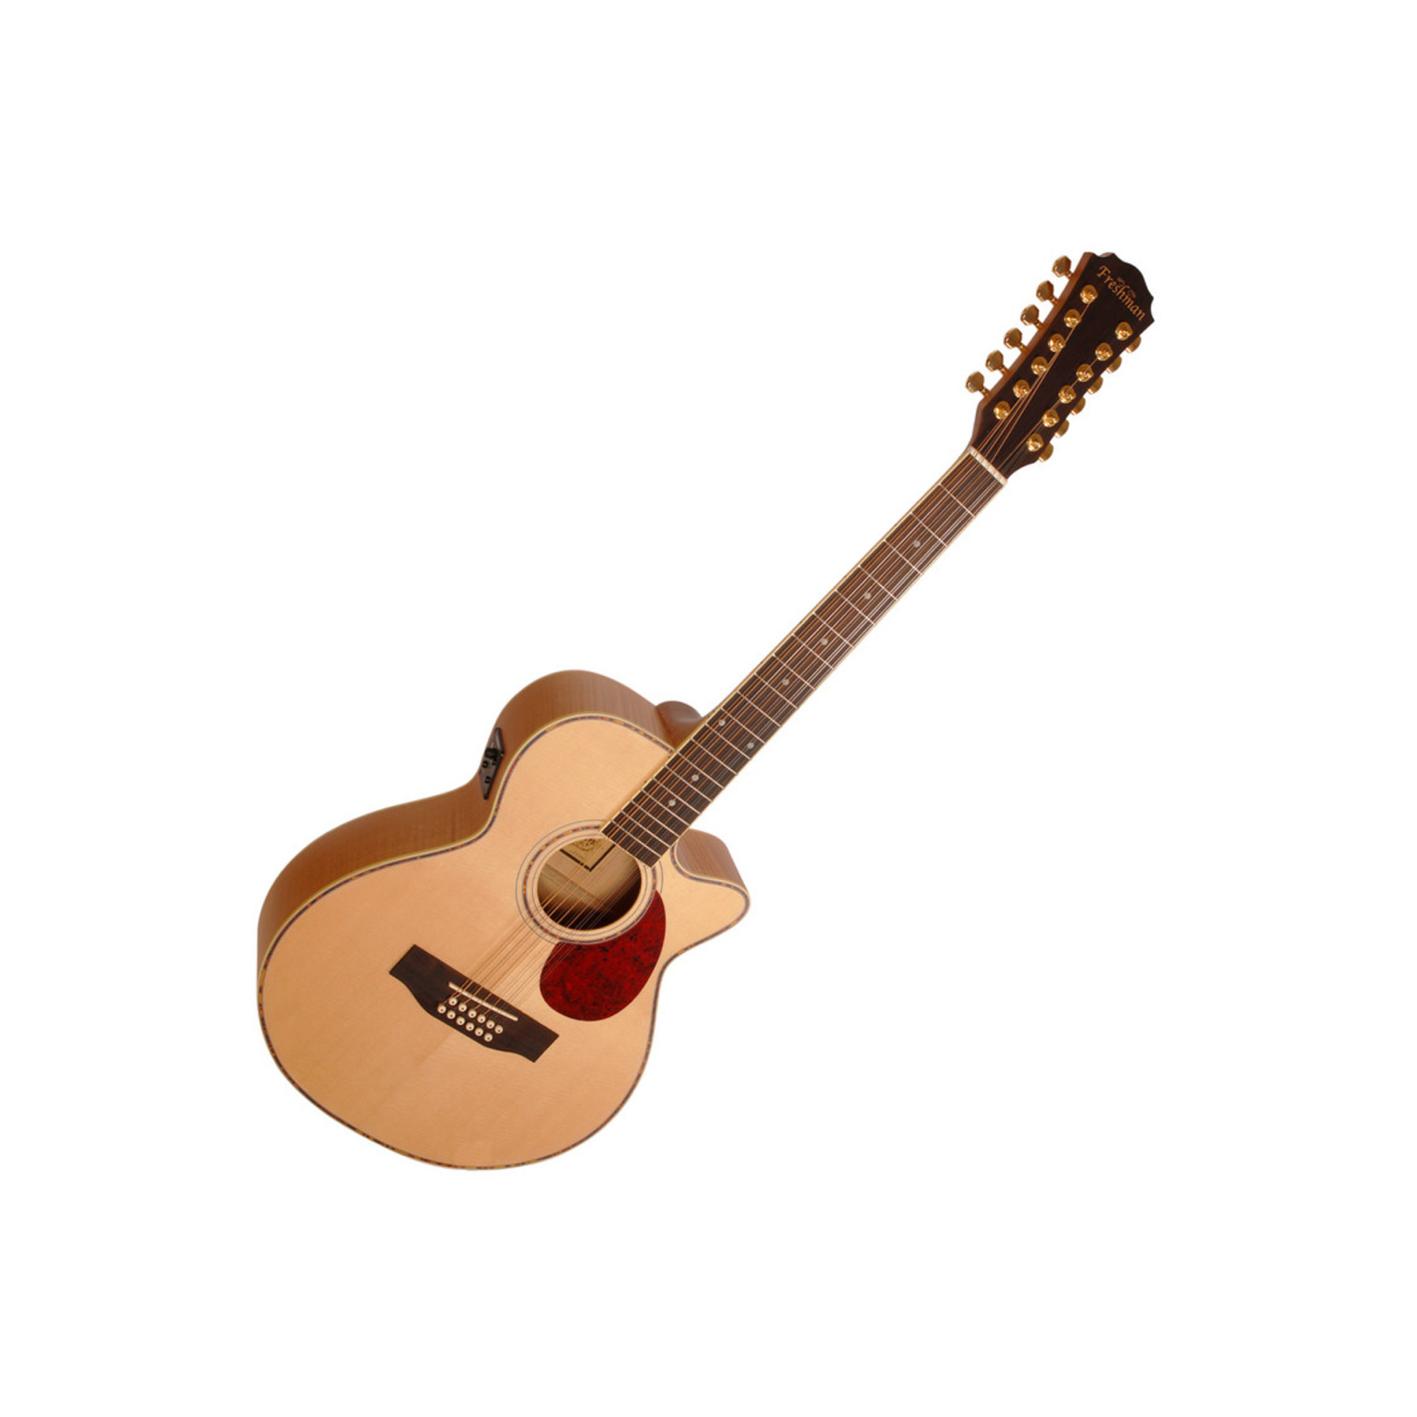 Freshman FA1AM12 Maple 12 String Electro Acoustic w/ Gig Bag (Second Hand)